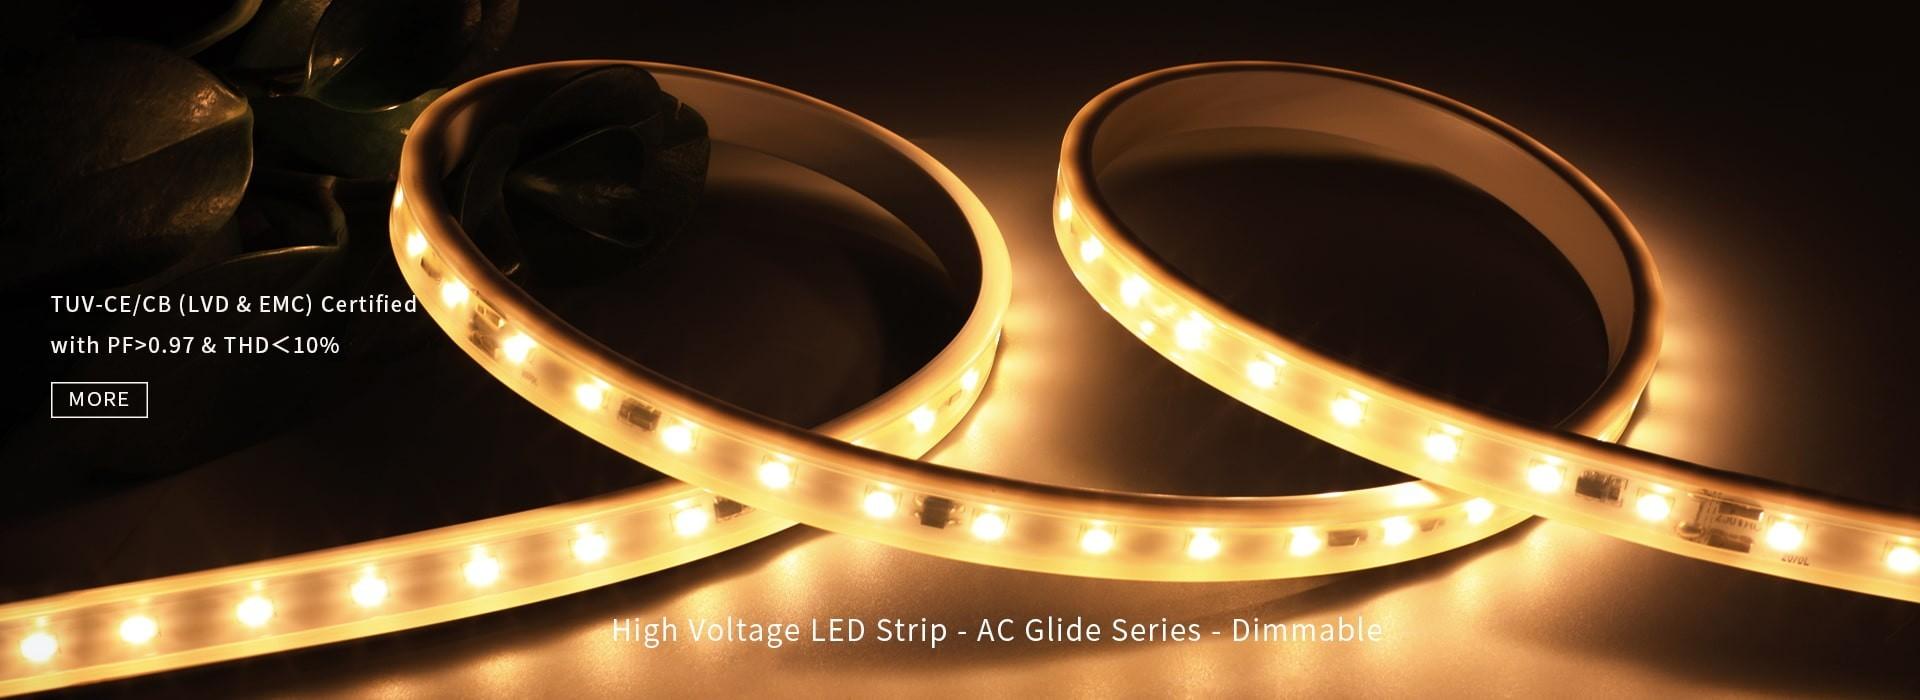 高压LED灯条-AC滑行系列-811XD-0024-002A可调光